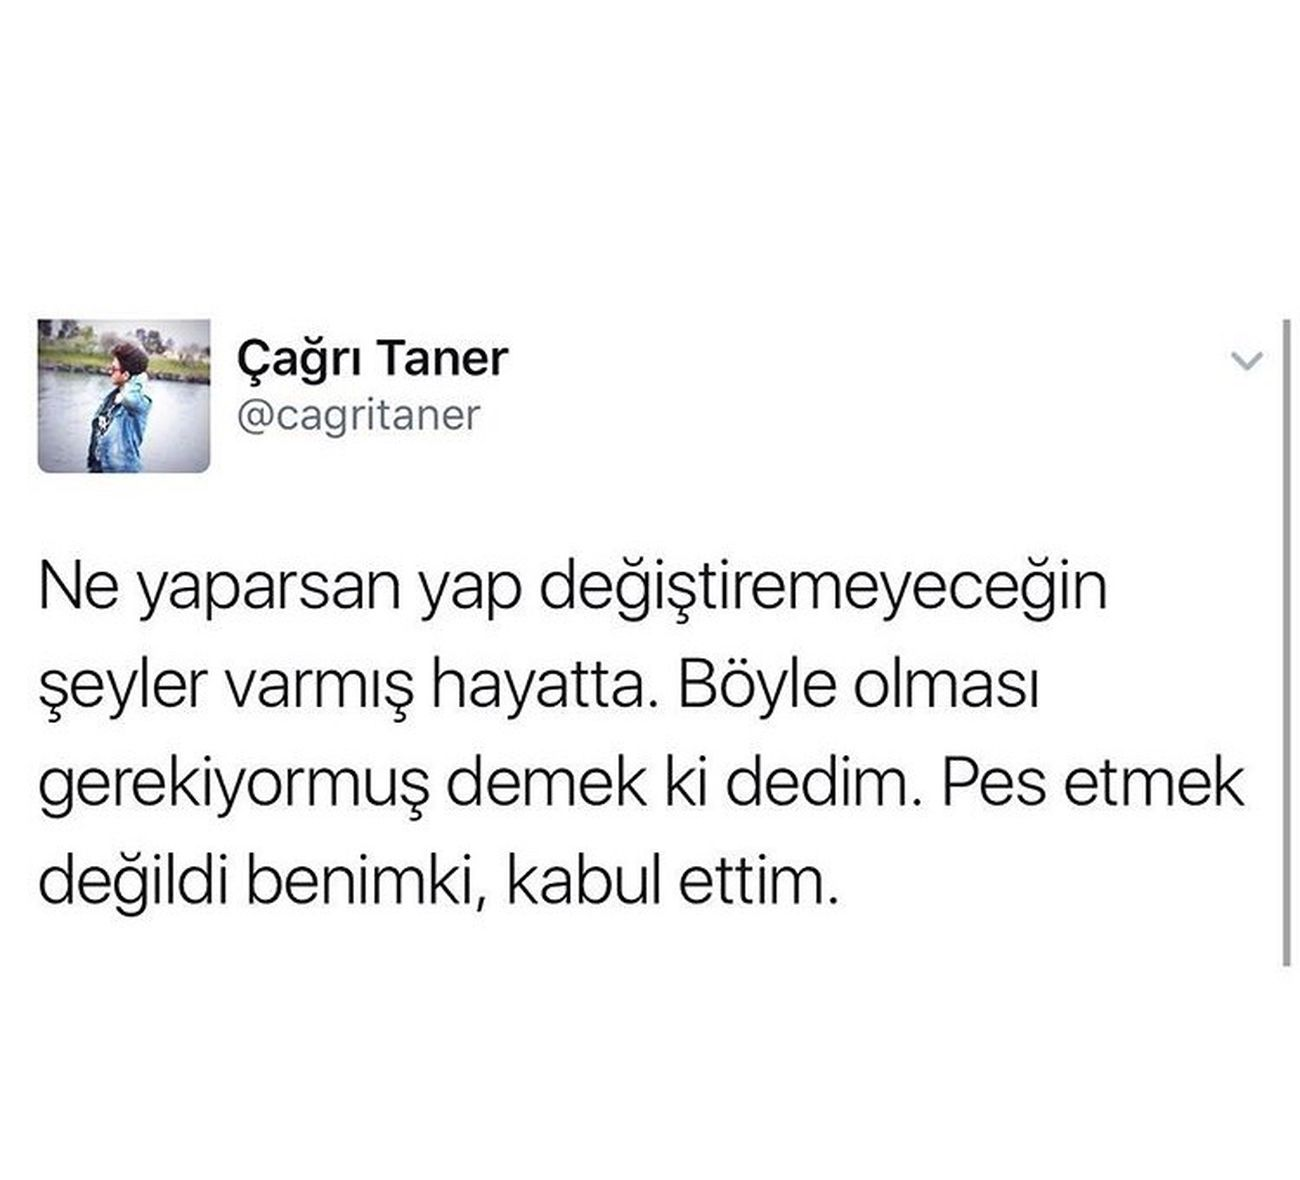 Mugla Antalya Istanbul Konya Samsun #Karadeniz Akdeniz Marmaris Rize